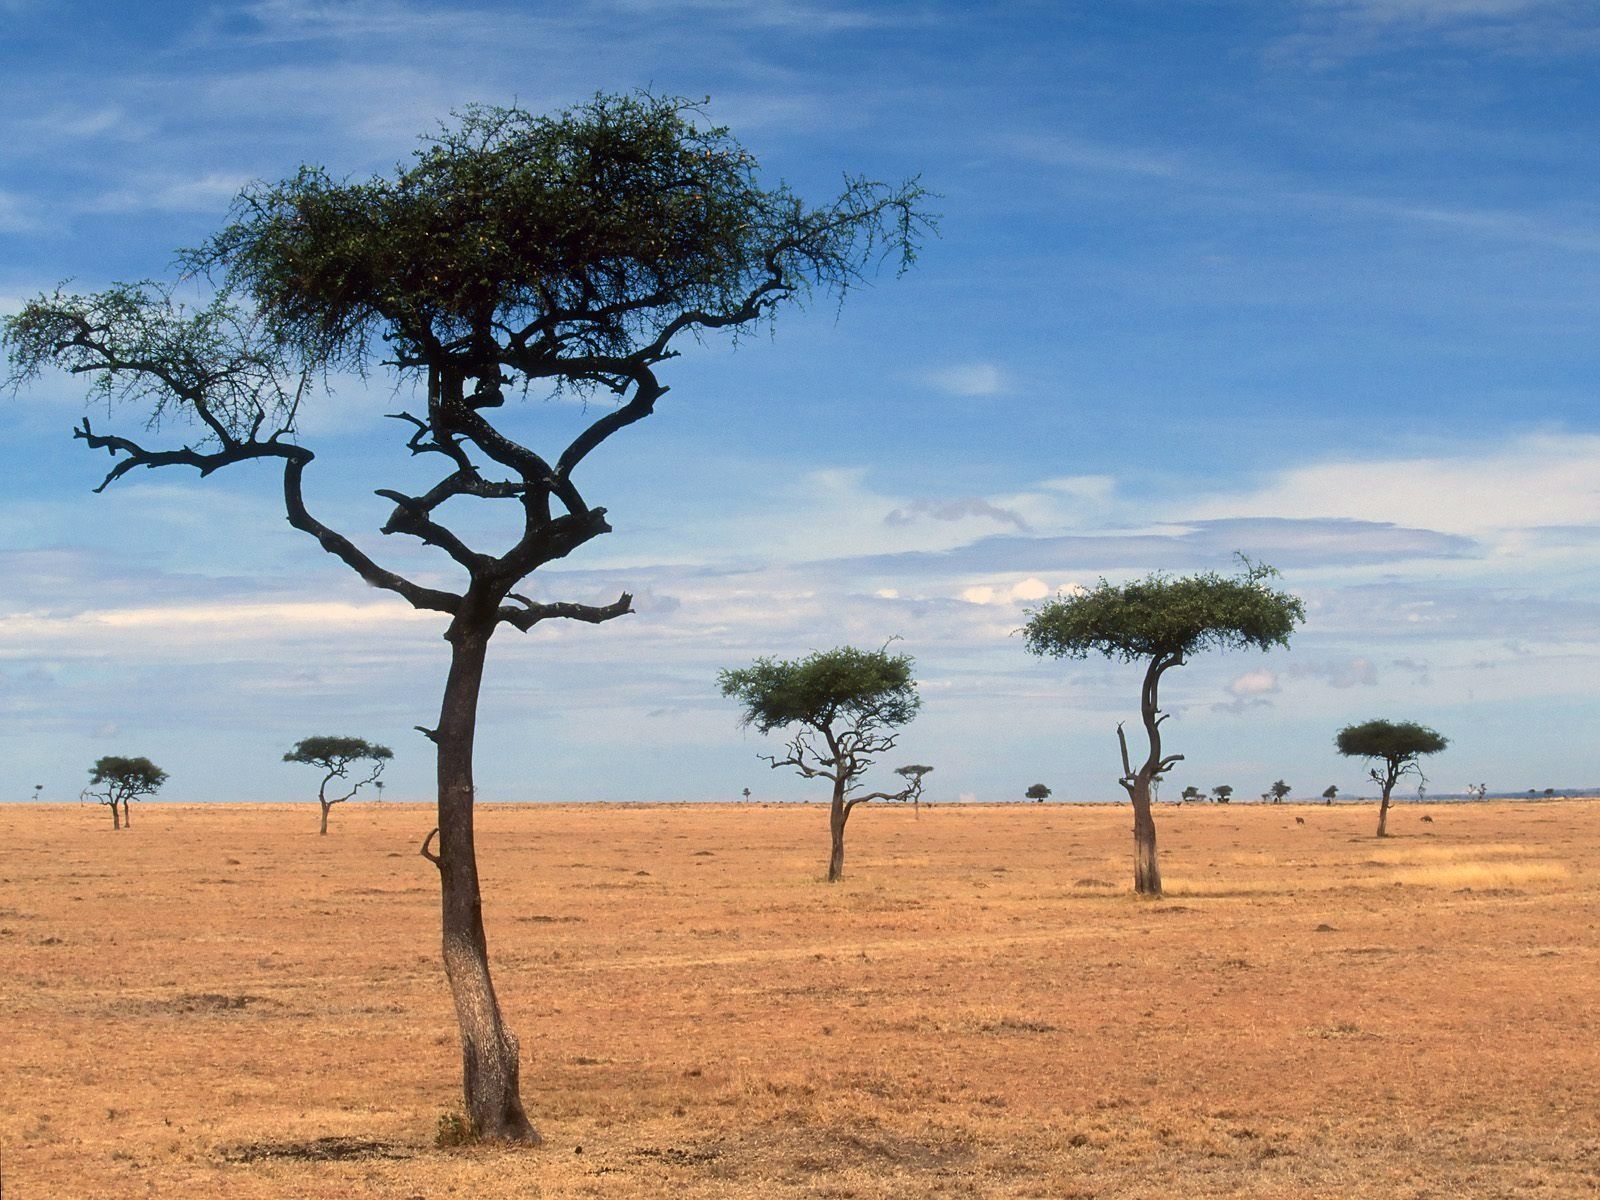 Scattered Acacia Trees Kenya Africa Africa Photography Landscape Kenya Africa [ 1200 x 1600 Pixel ]